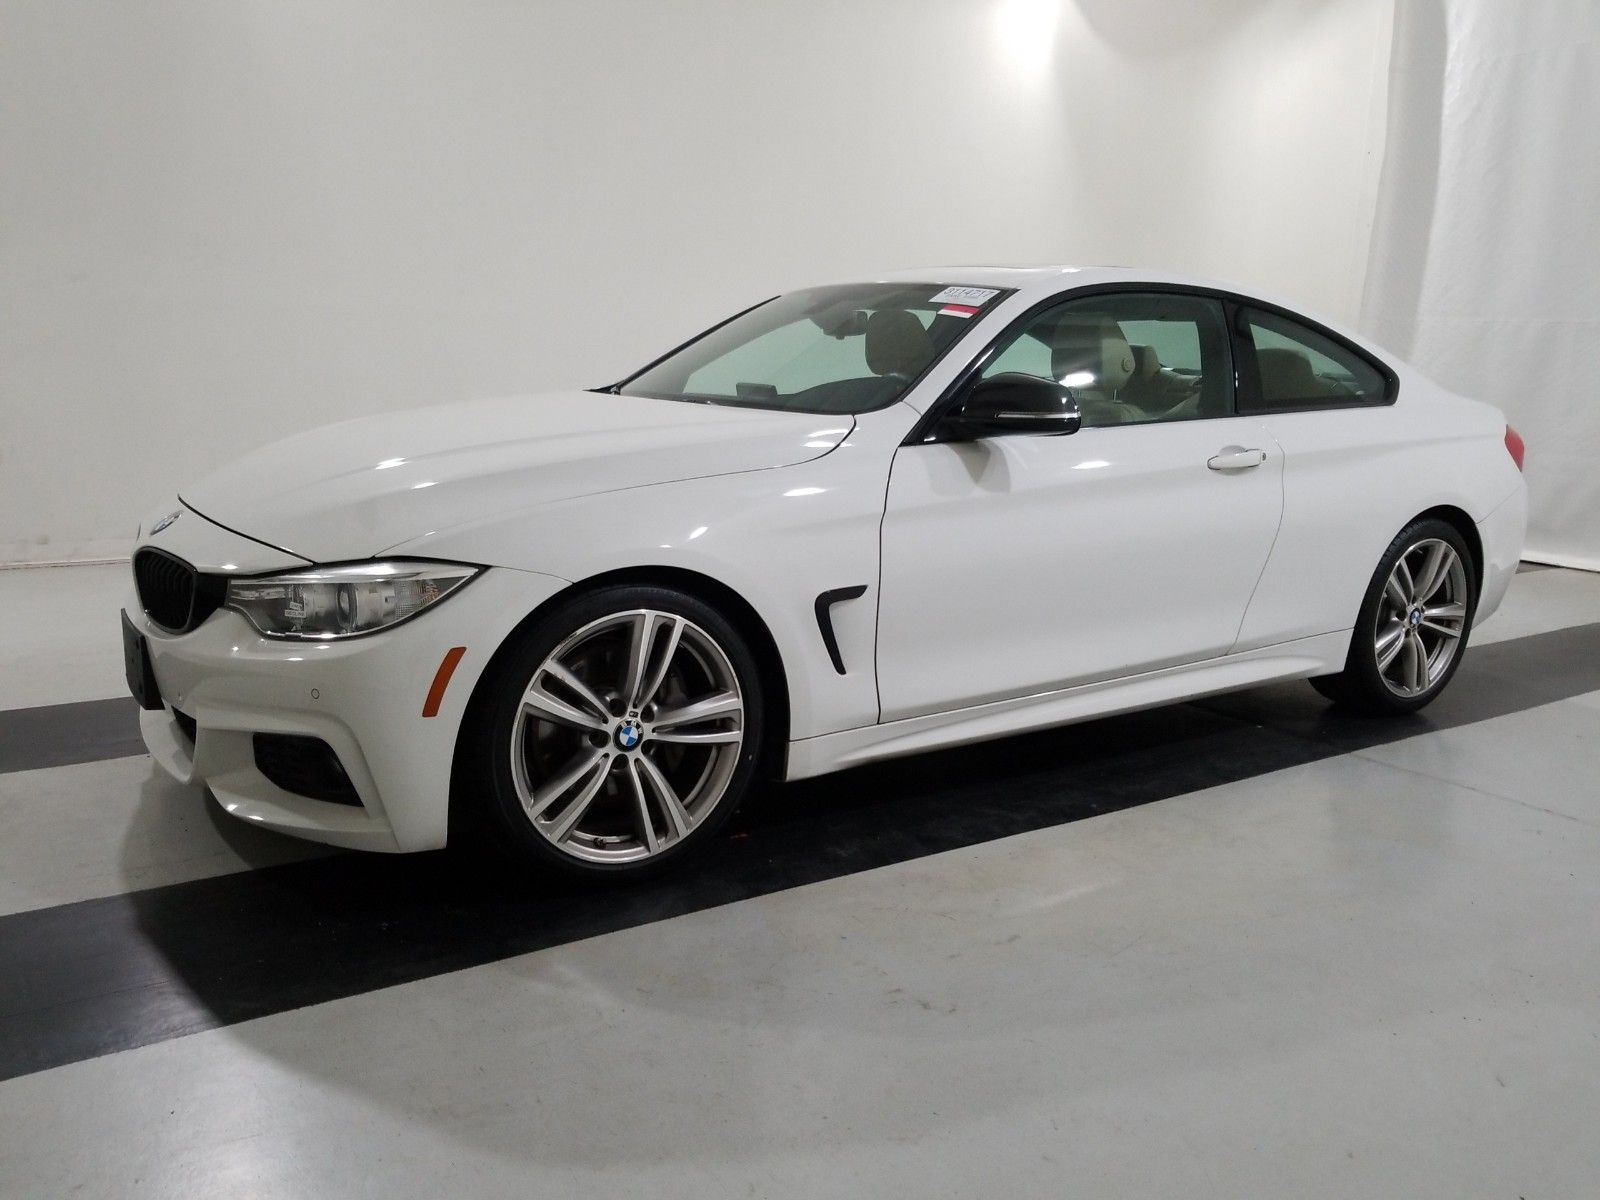 2017 BMW 440I 3.0. Lot 99913841100 Vin WBA4P1C53HK522516